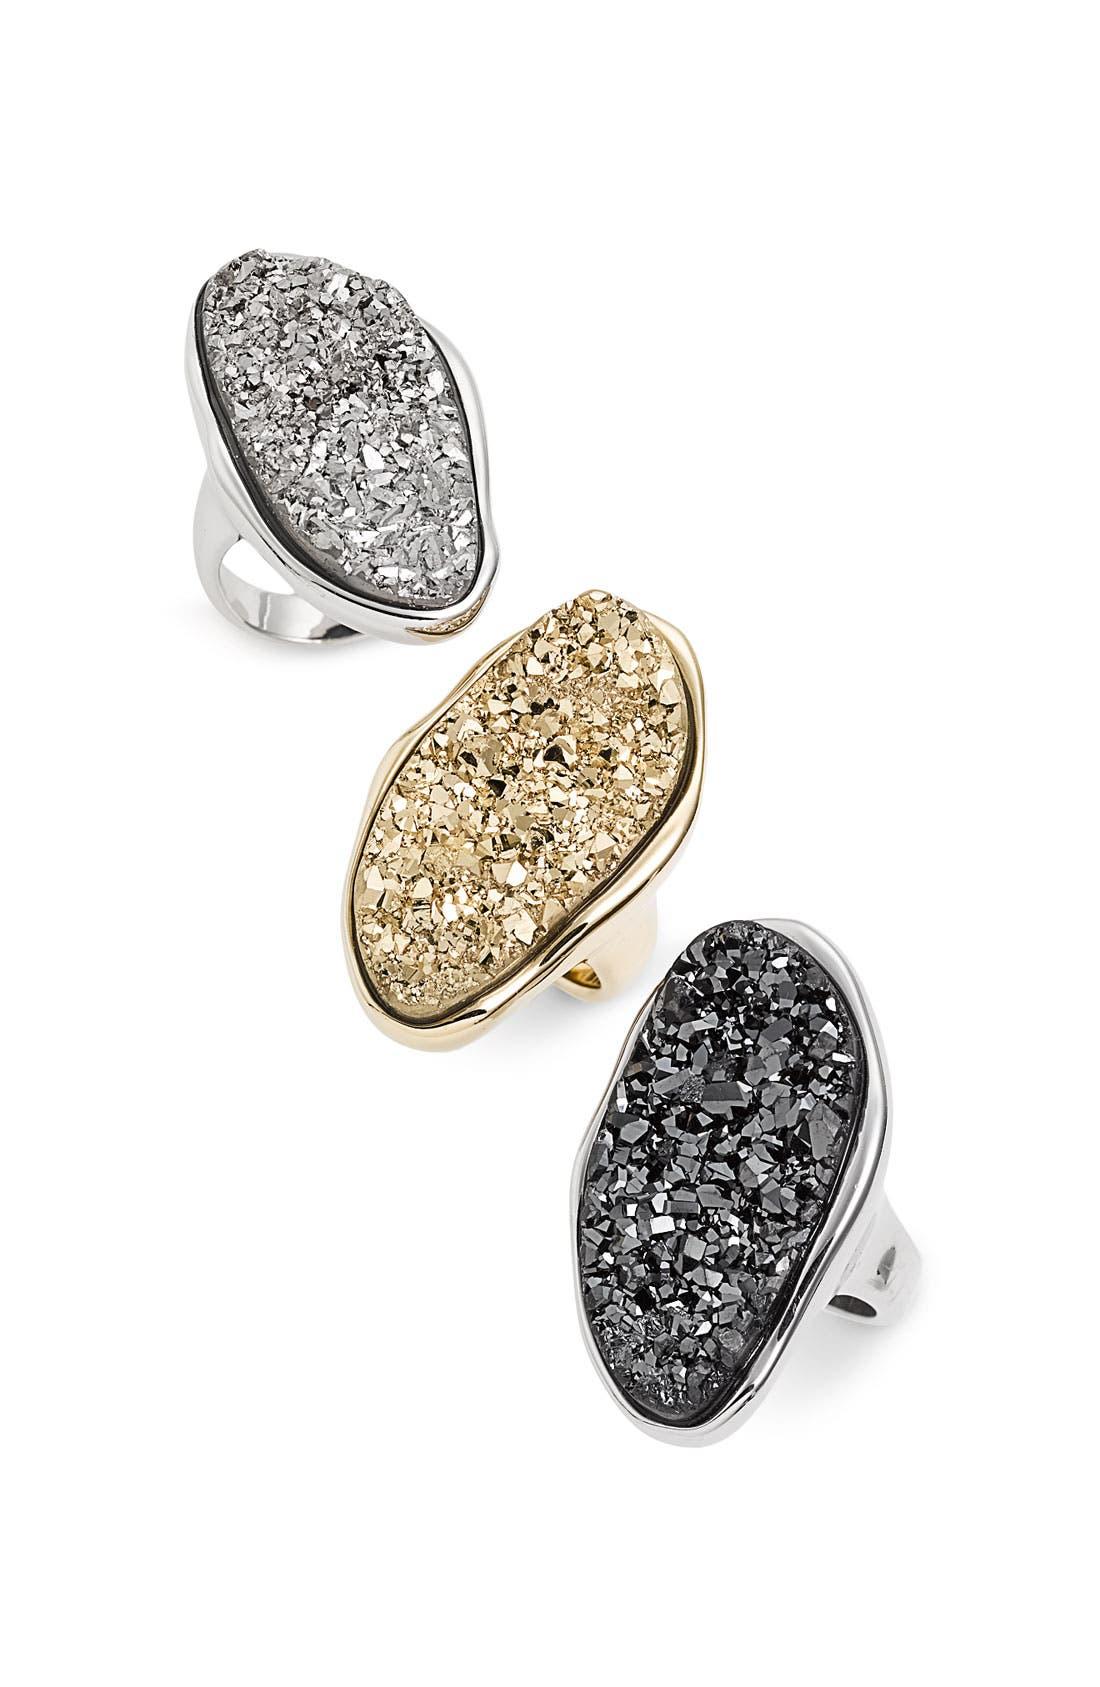 Alternate Image 2  - Marcia Moran Oval Agate Drusy Oversized Ring